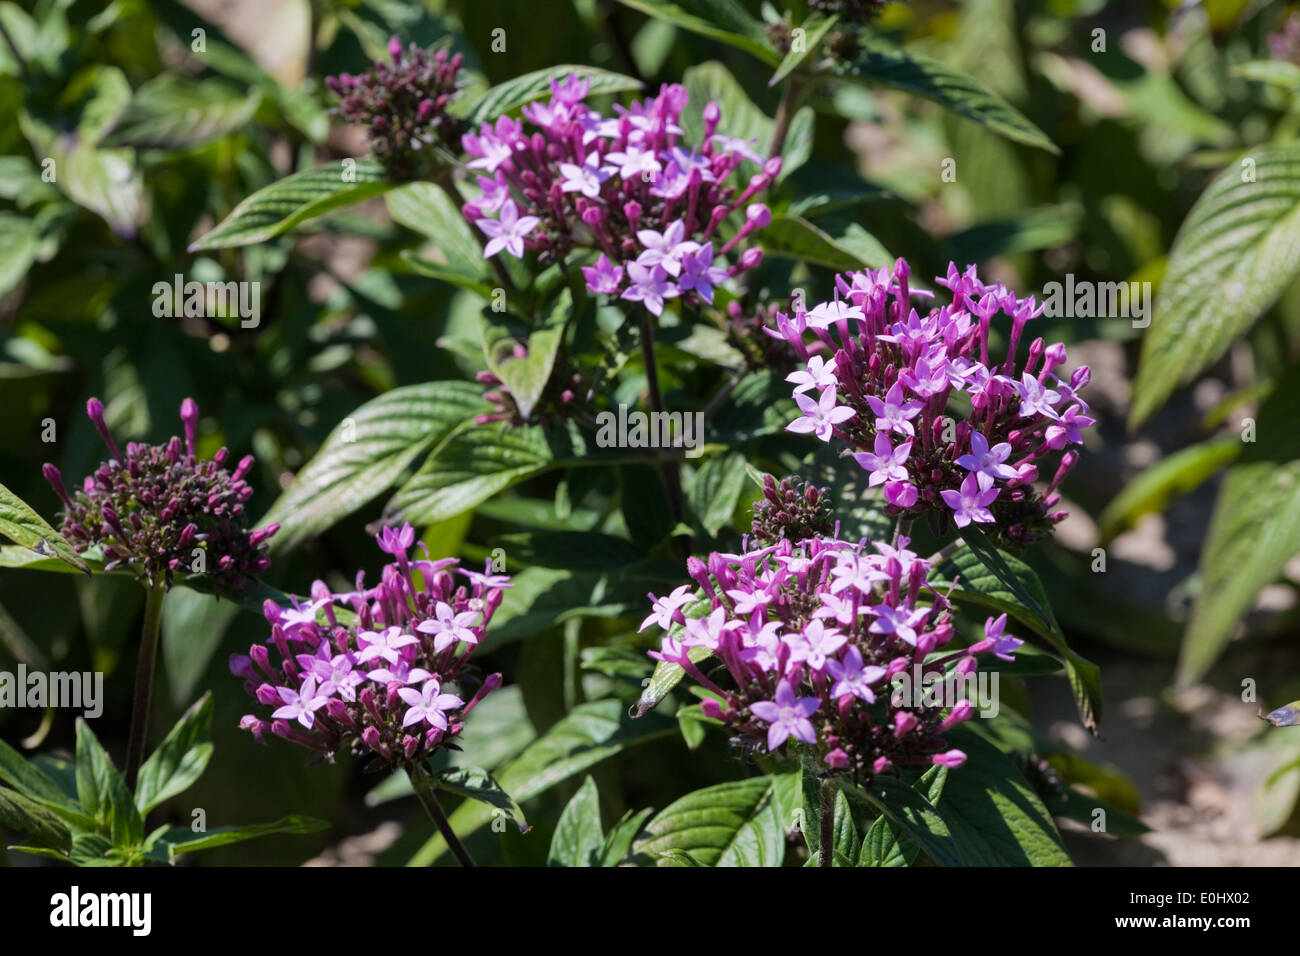 Sternblume, Graffiti Violett, (Pentas lanceolata), DIE GARTEN TULLN 2009 - Pentas lanceolata - Stock Image